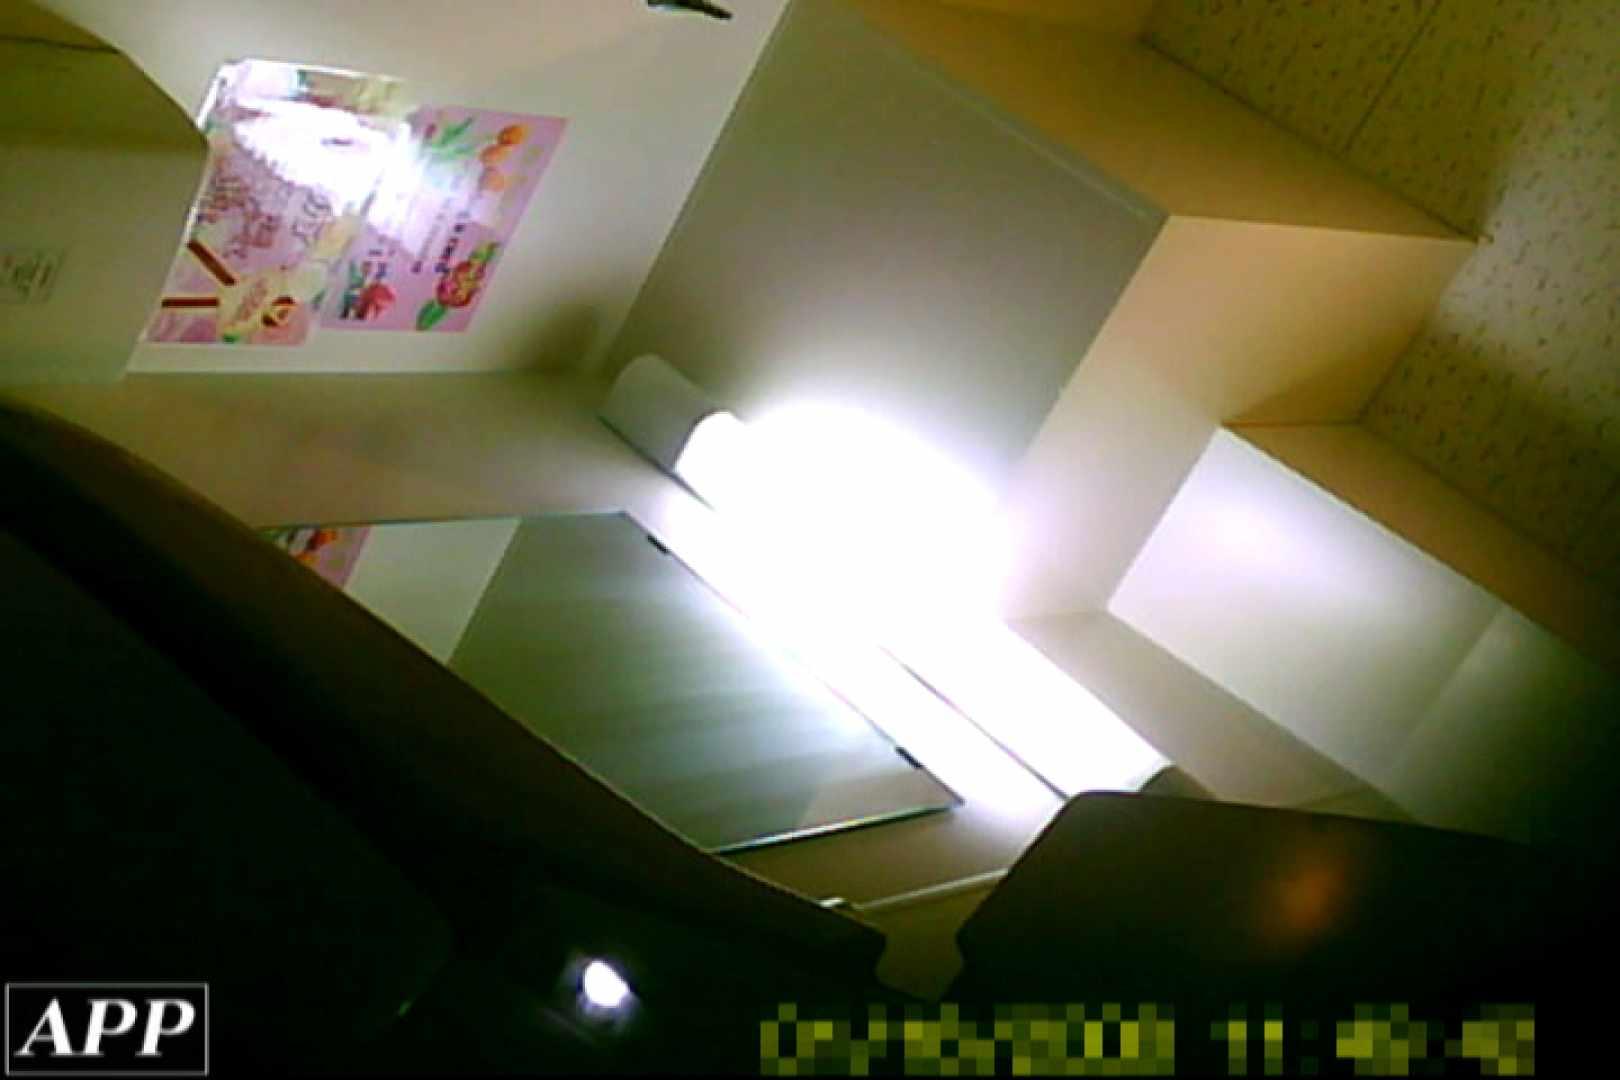 3視点洗面所 vol.127 OLハメ撮り  22Pix 22